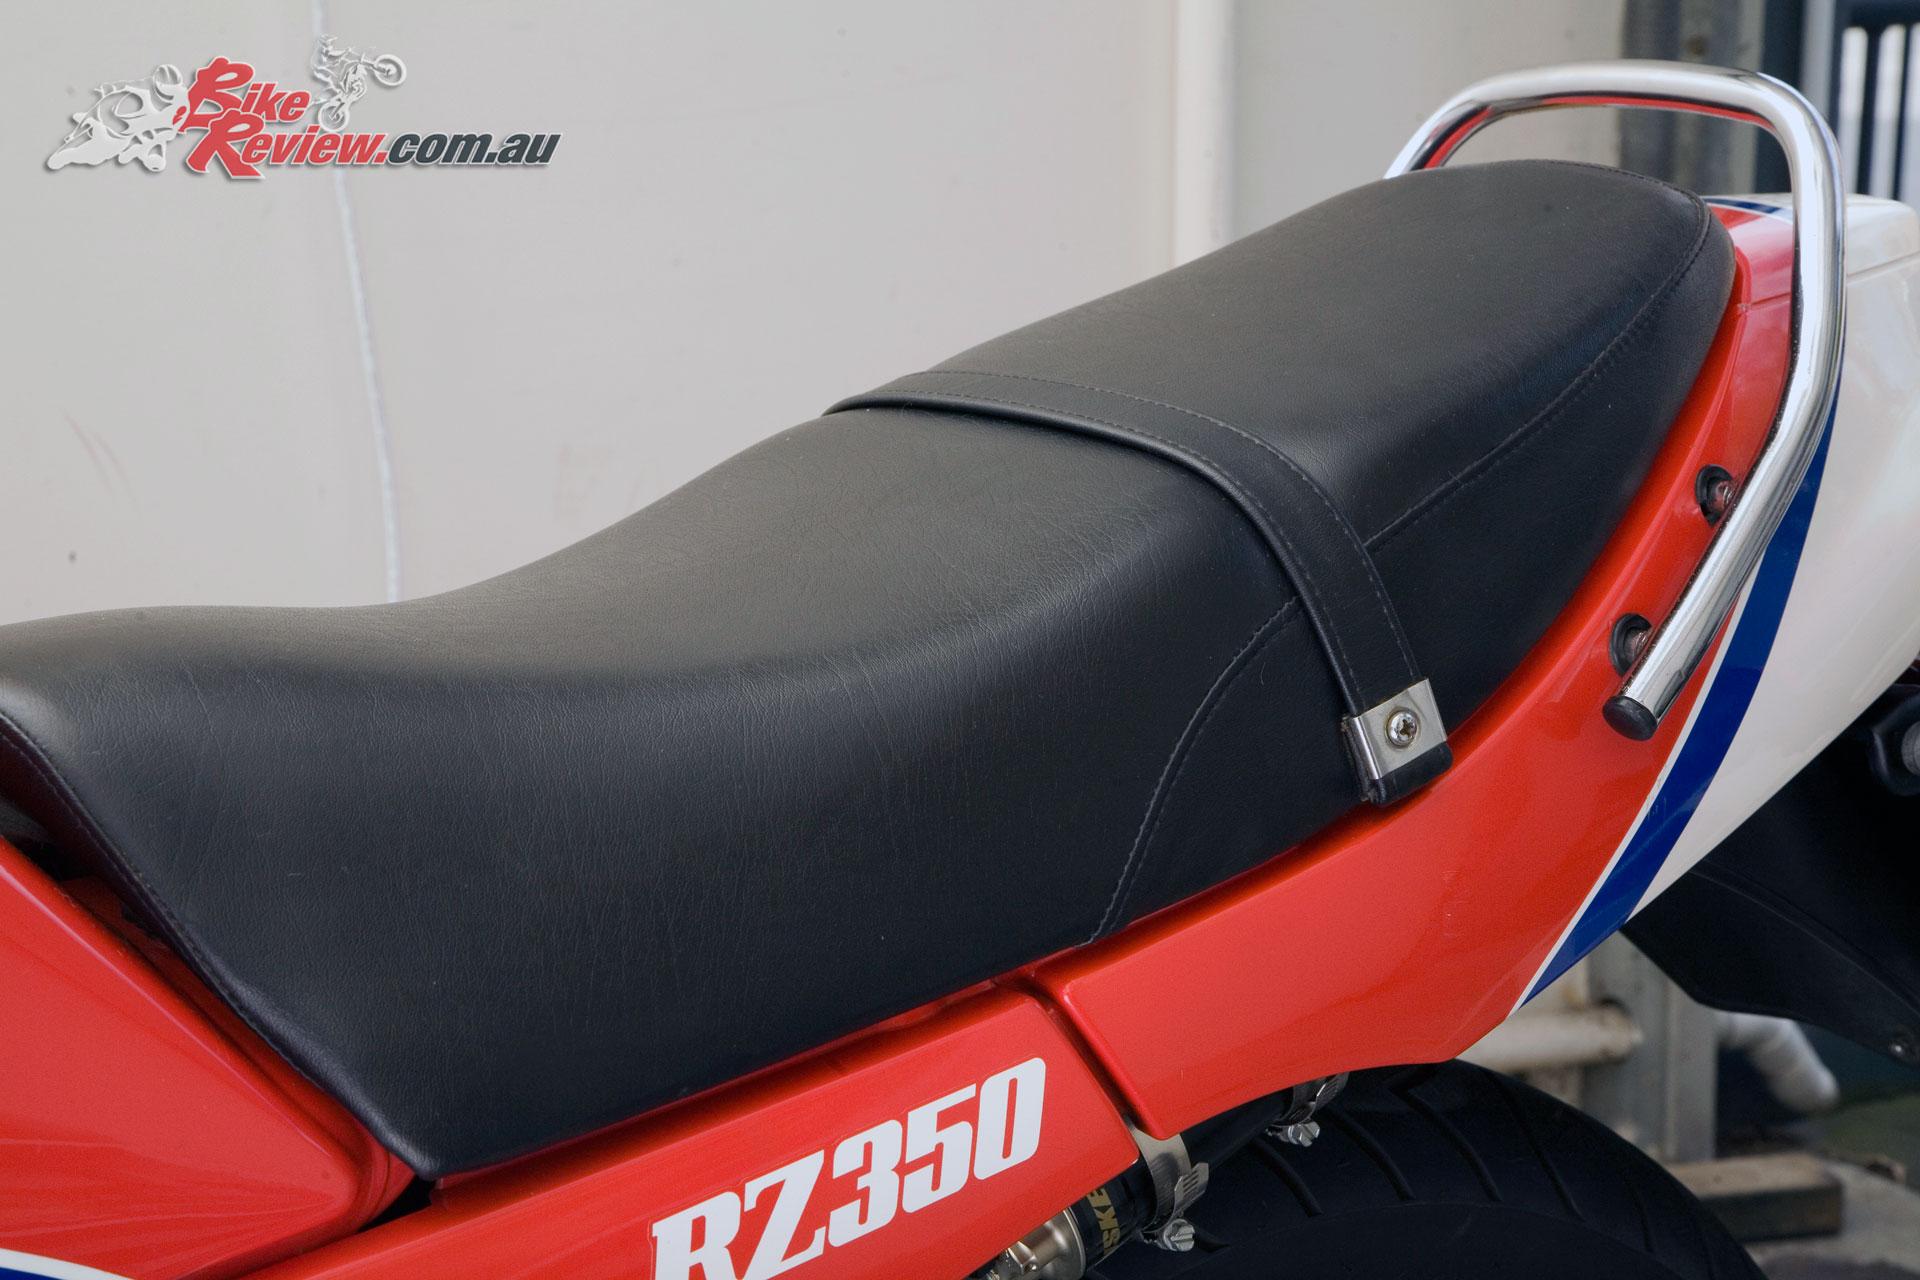 Used Bike: Yamaha RZ350 - Bike Review